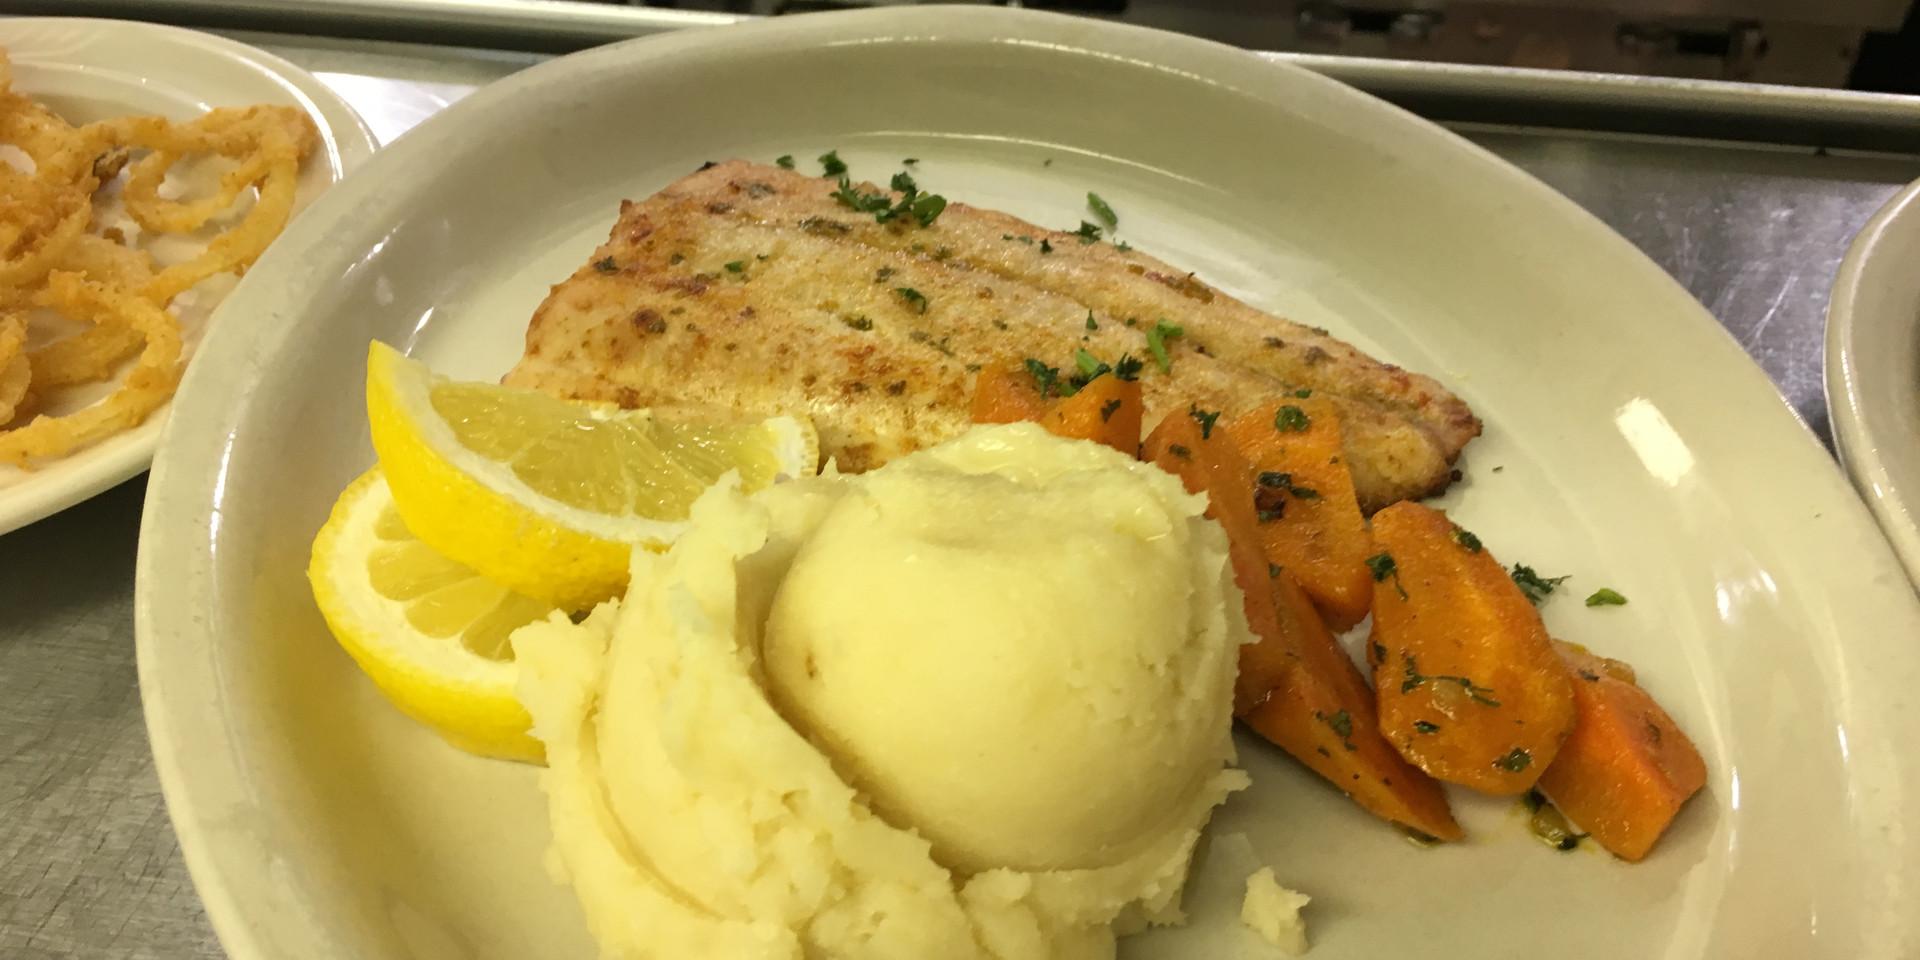 Parmesan Encrusted White Fish